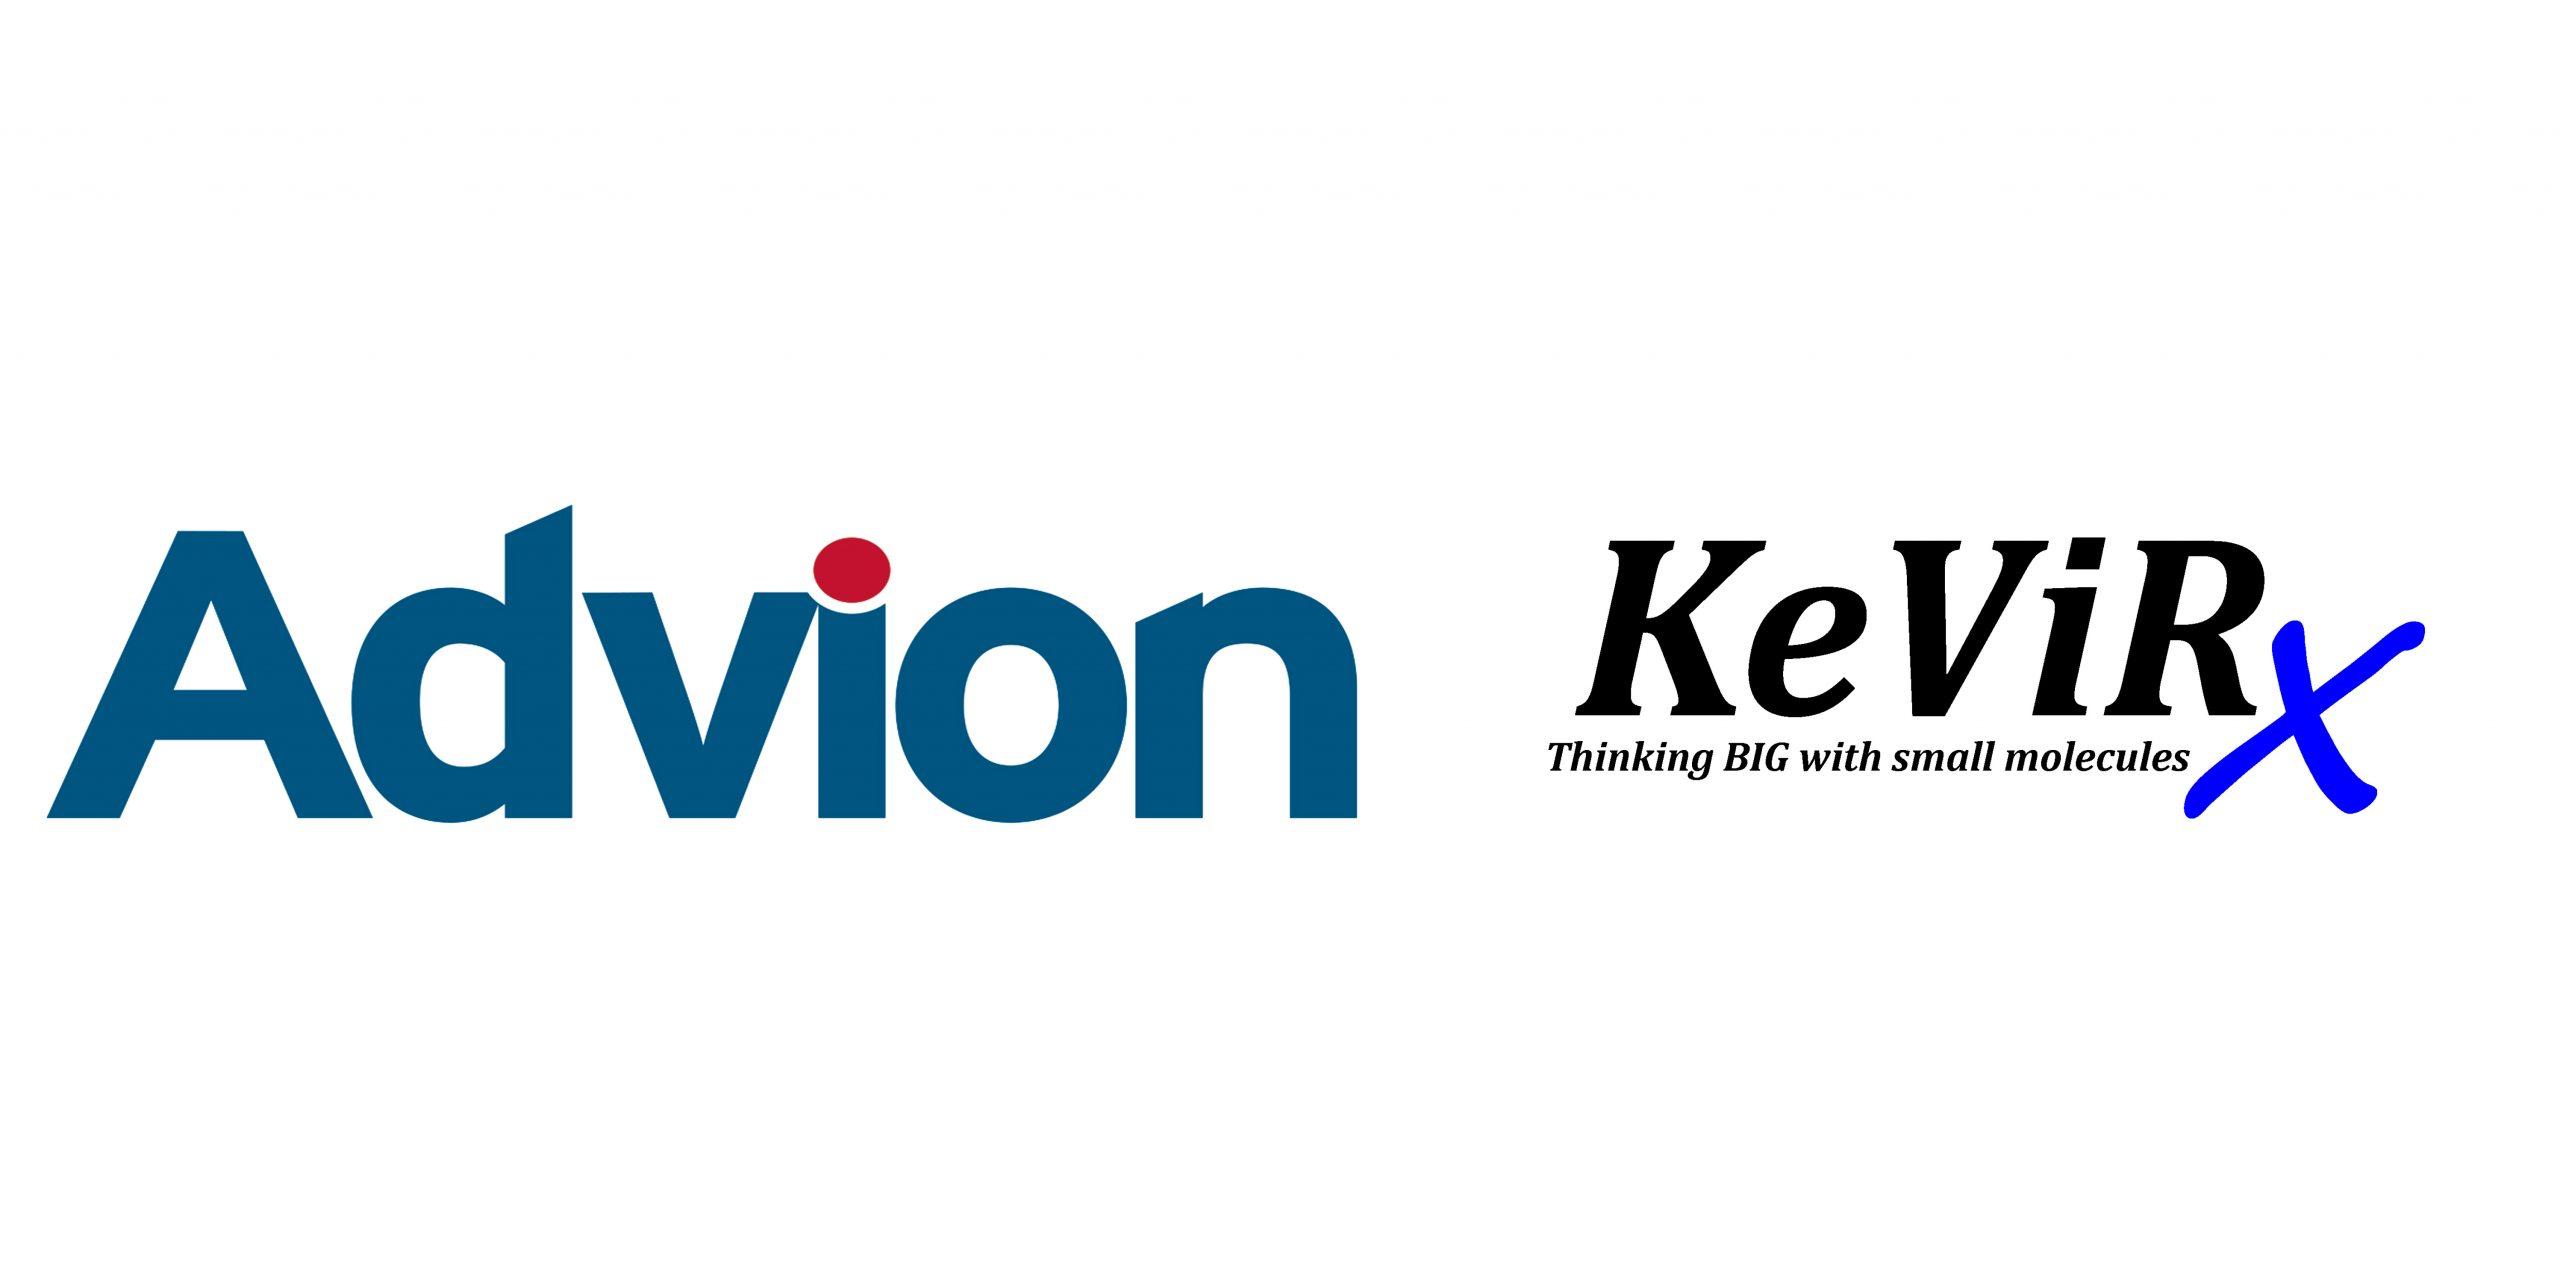 Advion and KeViRx logos